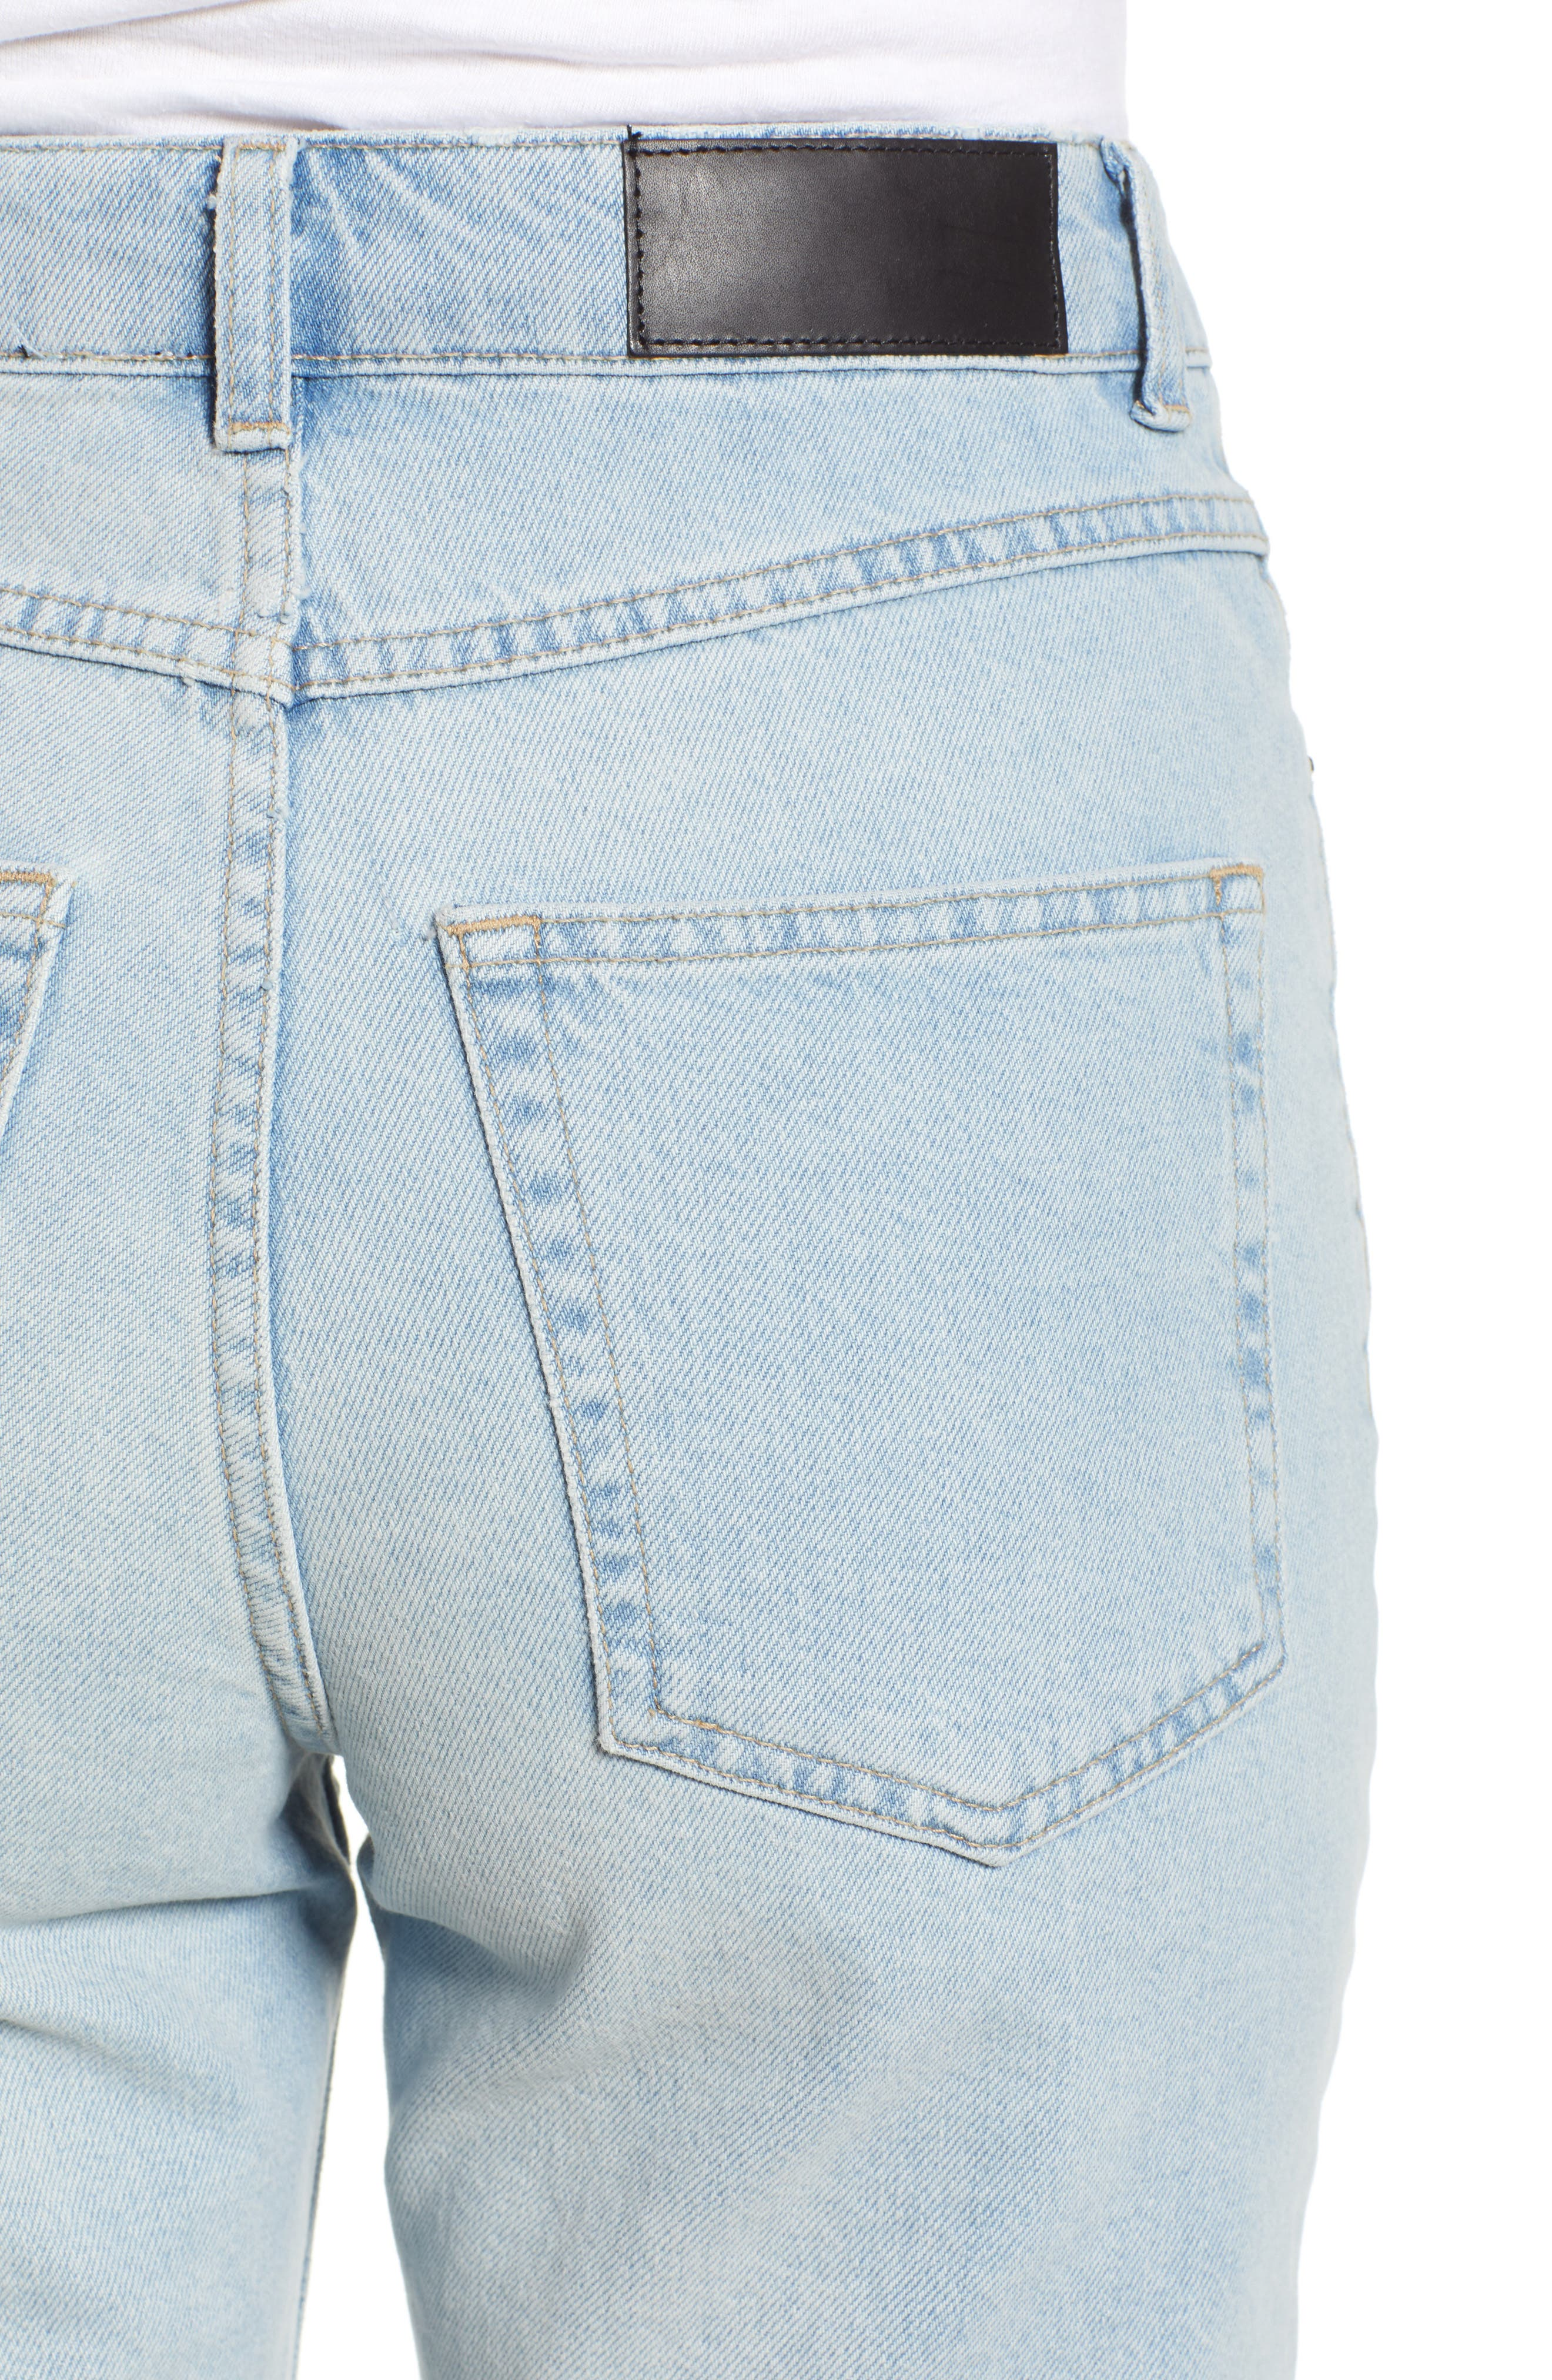 Bleach Denim Board Shorts,                             Alternate thumbnail 4, color,                             420